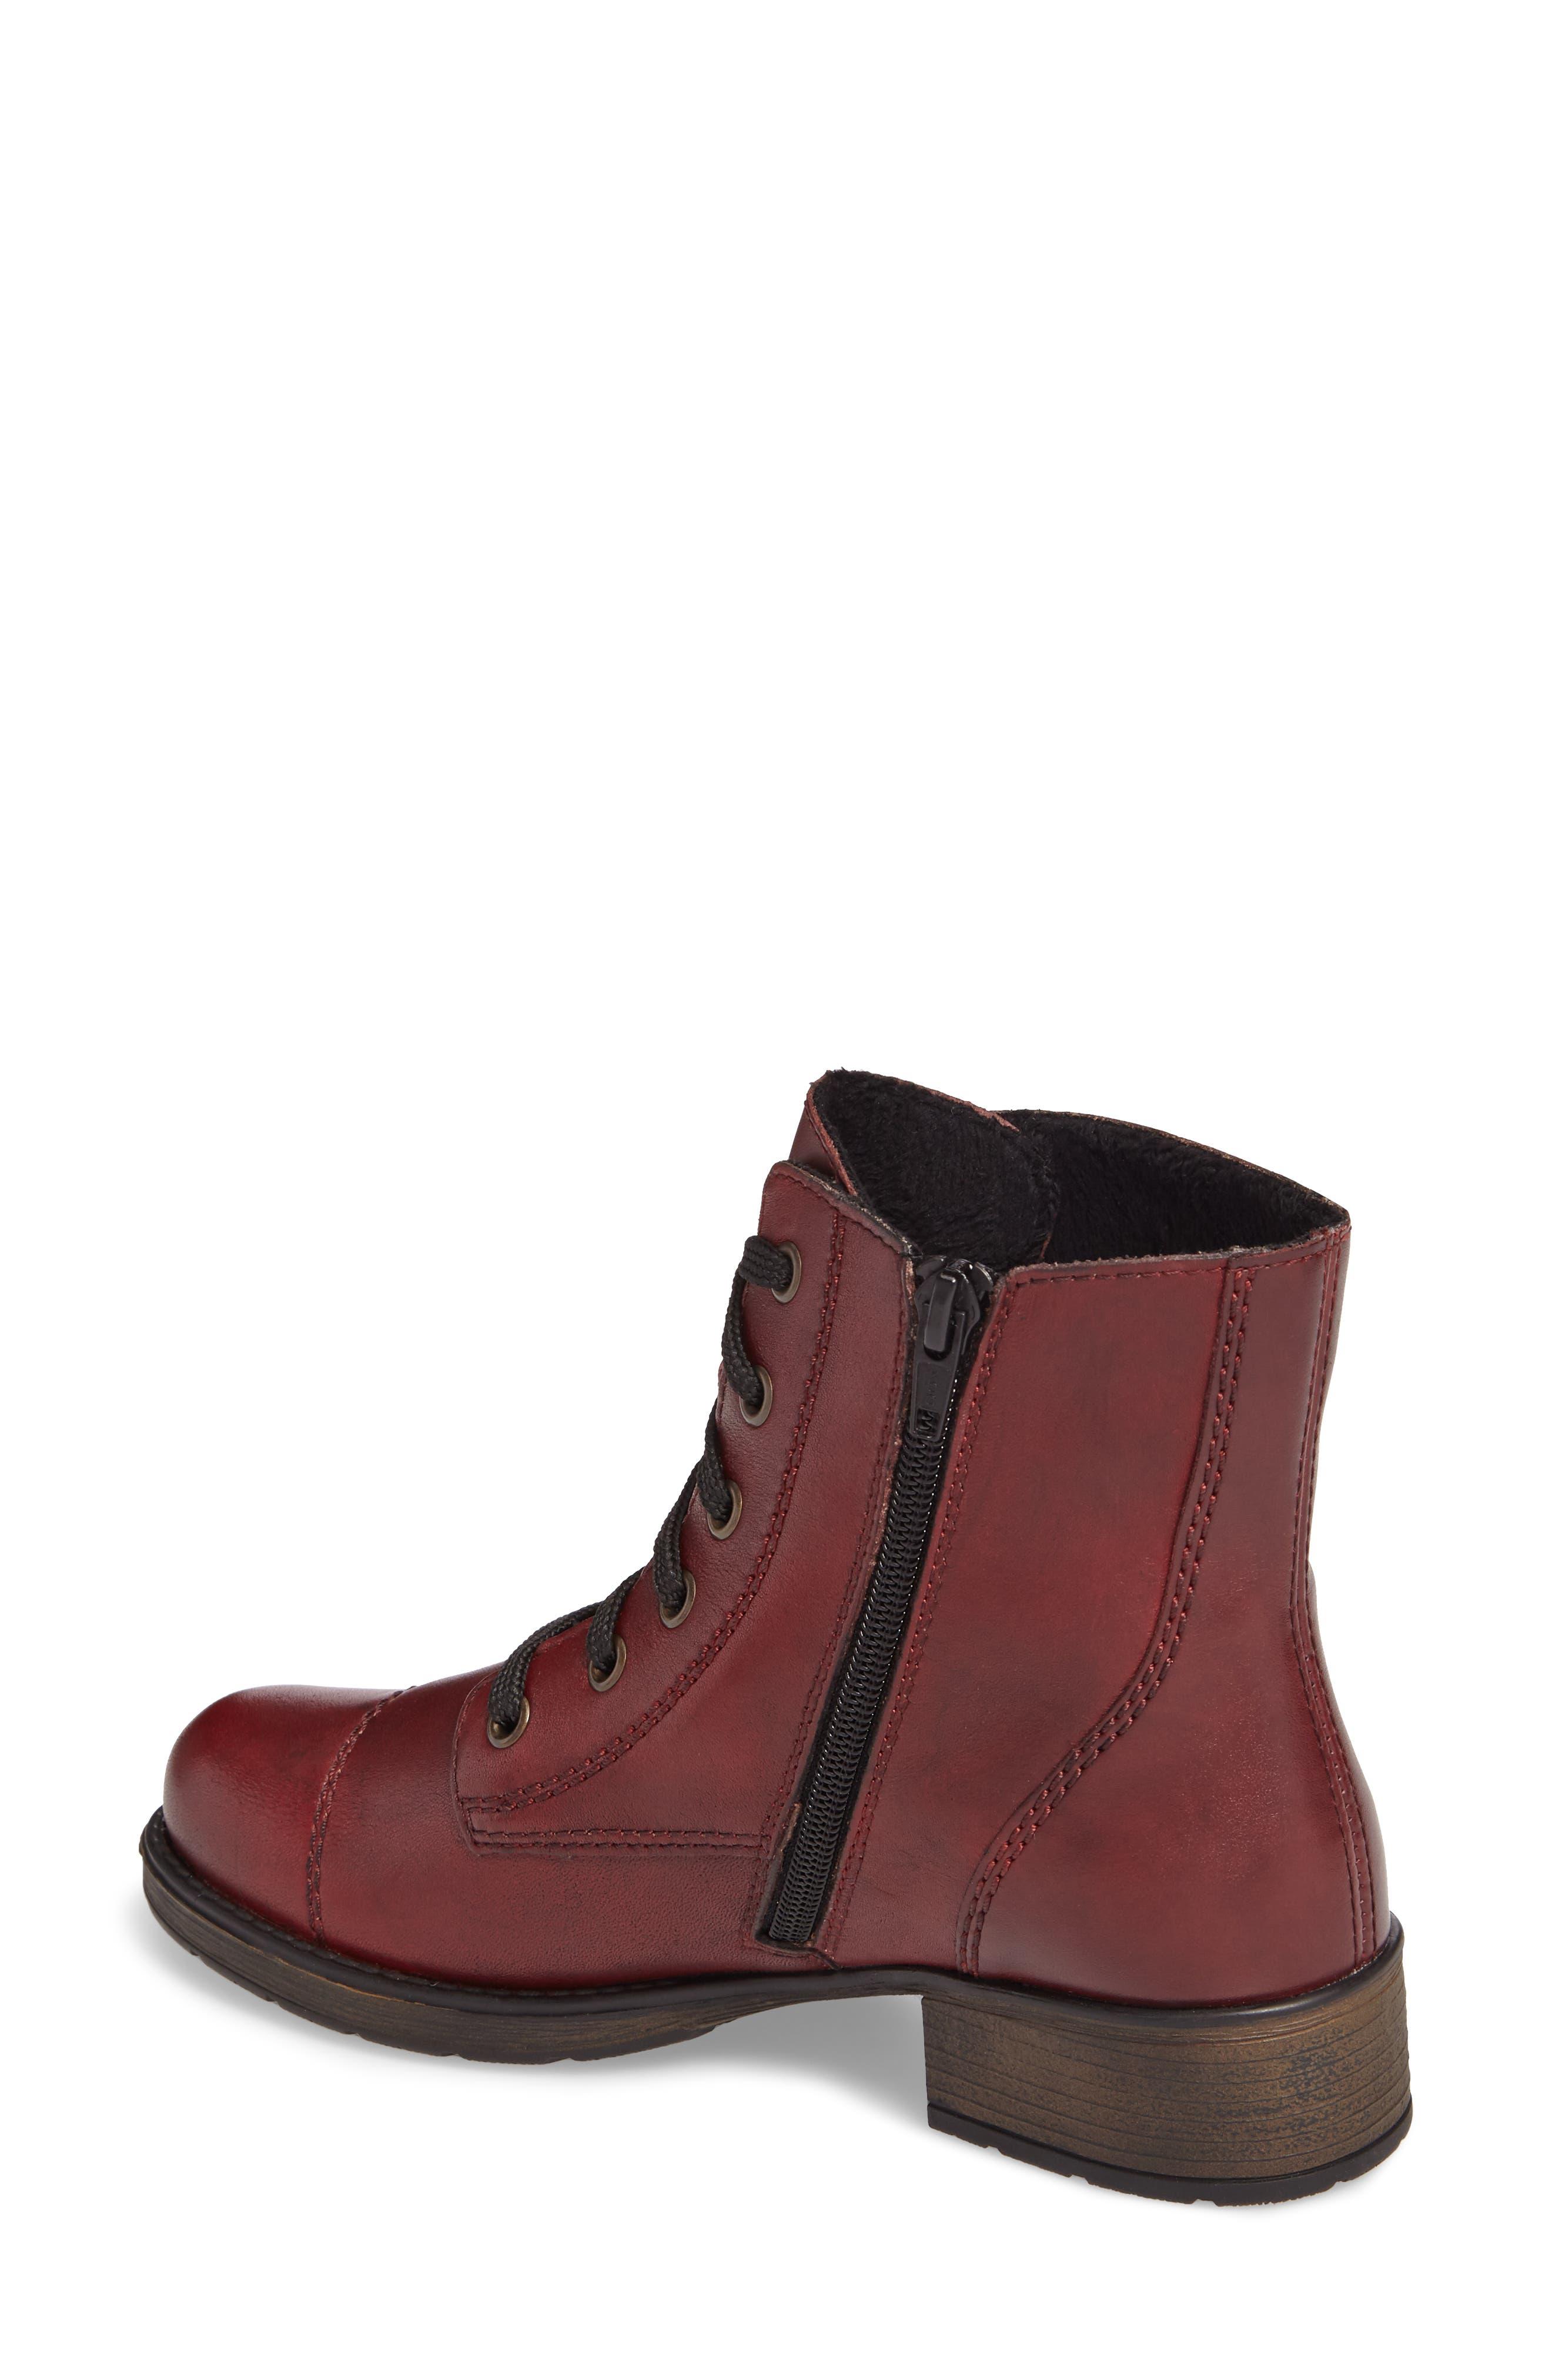 Alternate Image 2  - Rieker Antistress Faith 10 Lace-Up Boot (Women)